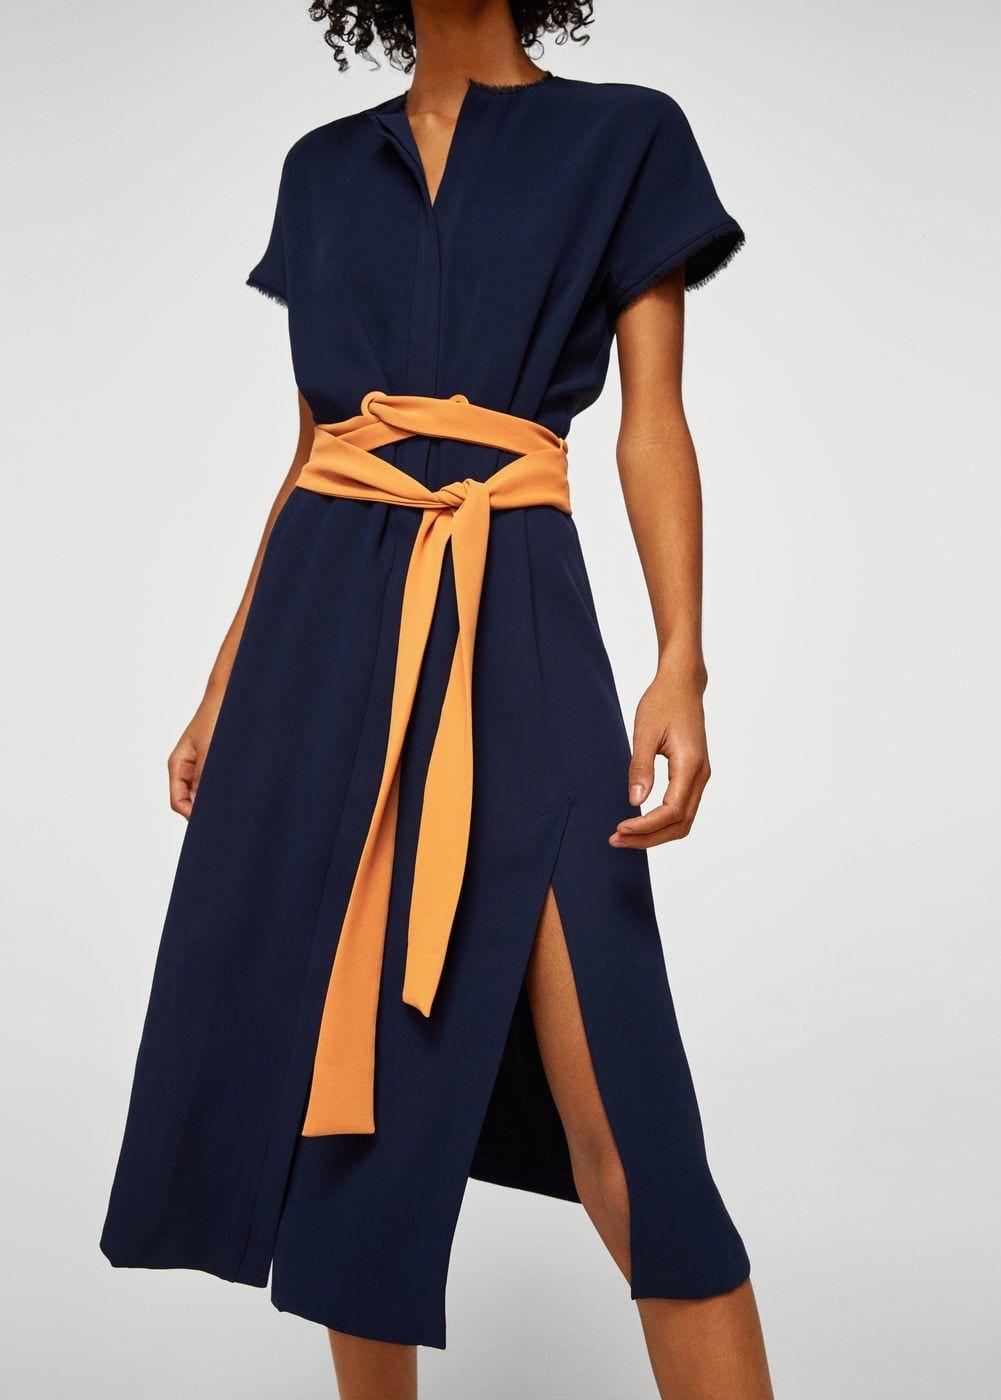 39e86b96a Vestido cinturón lazo - Mujer | Working Days Spring/Summer ...